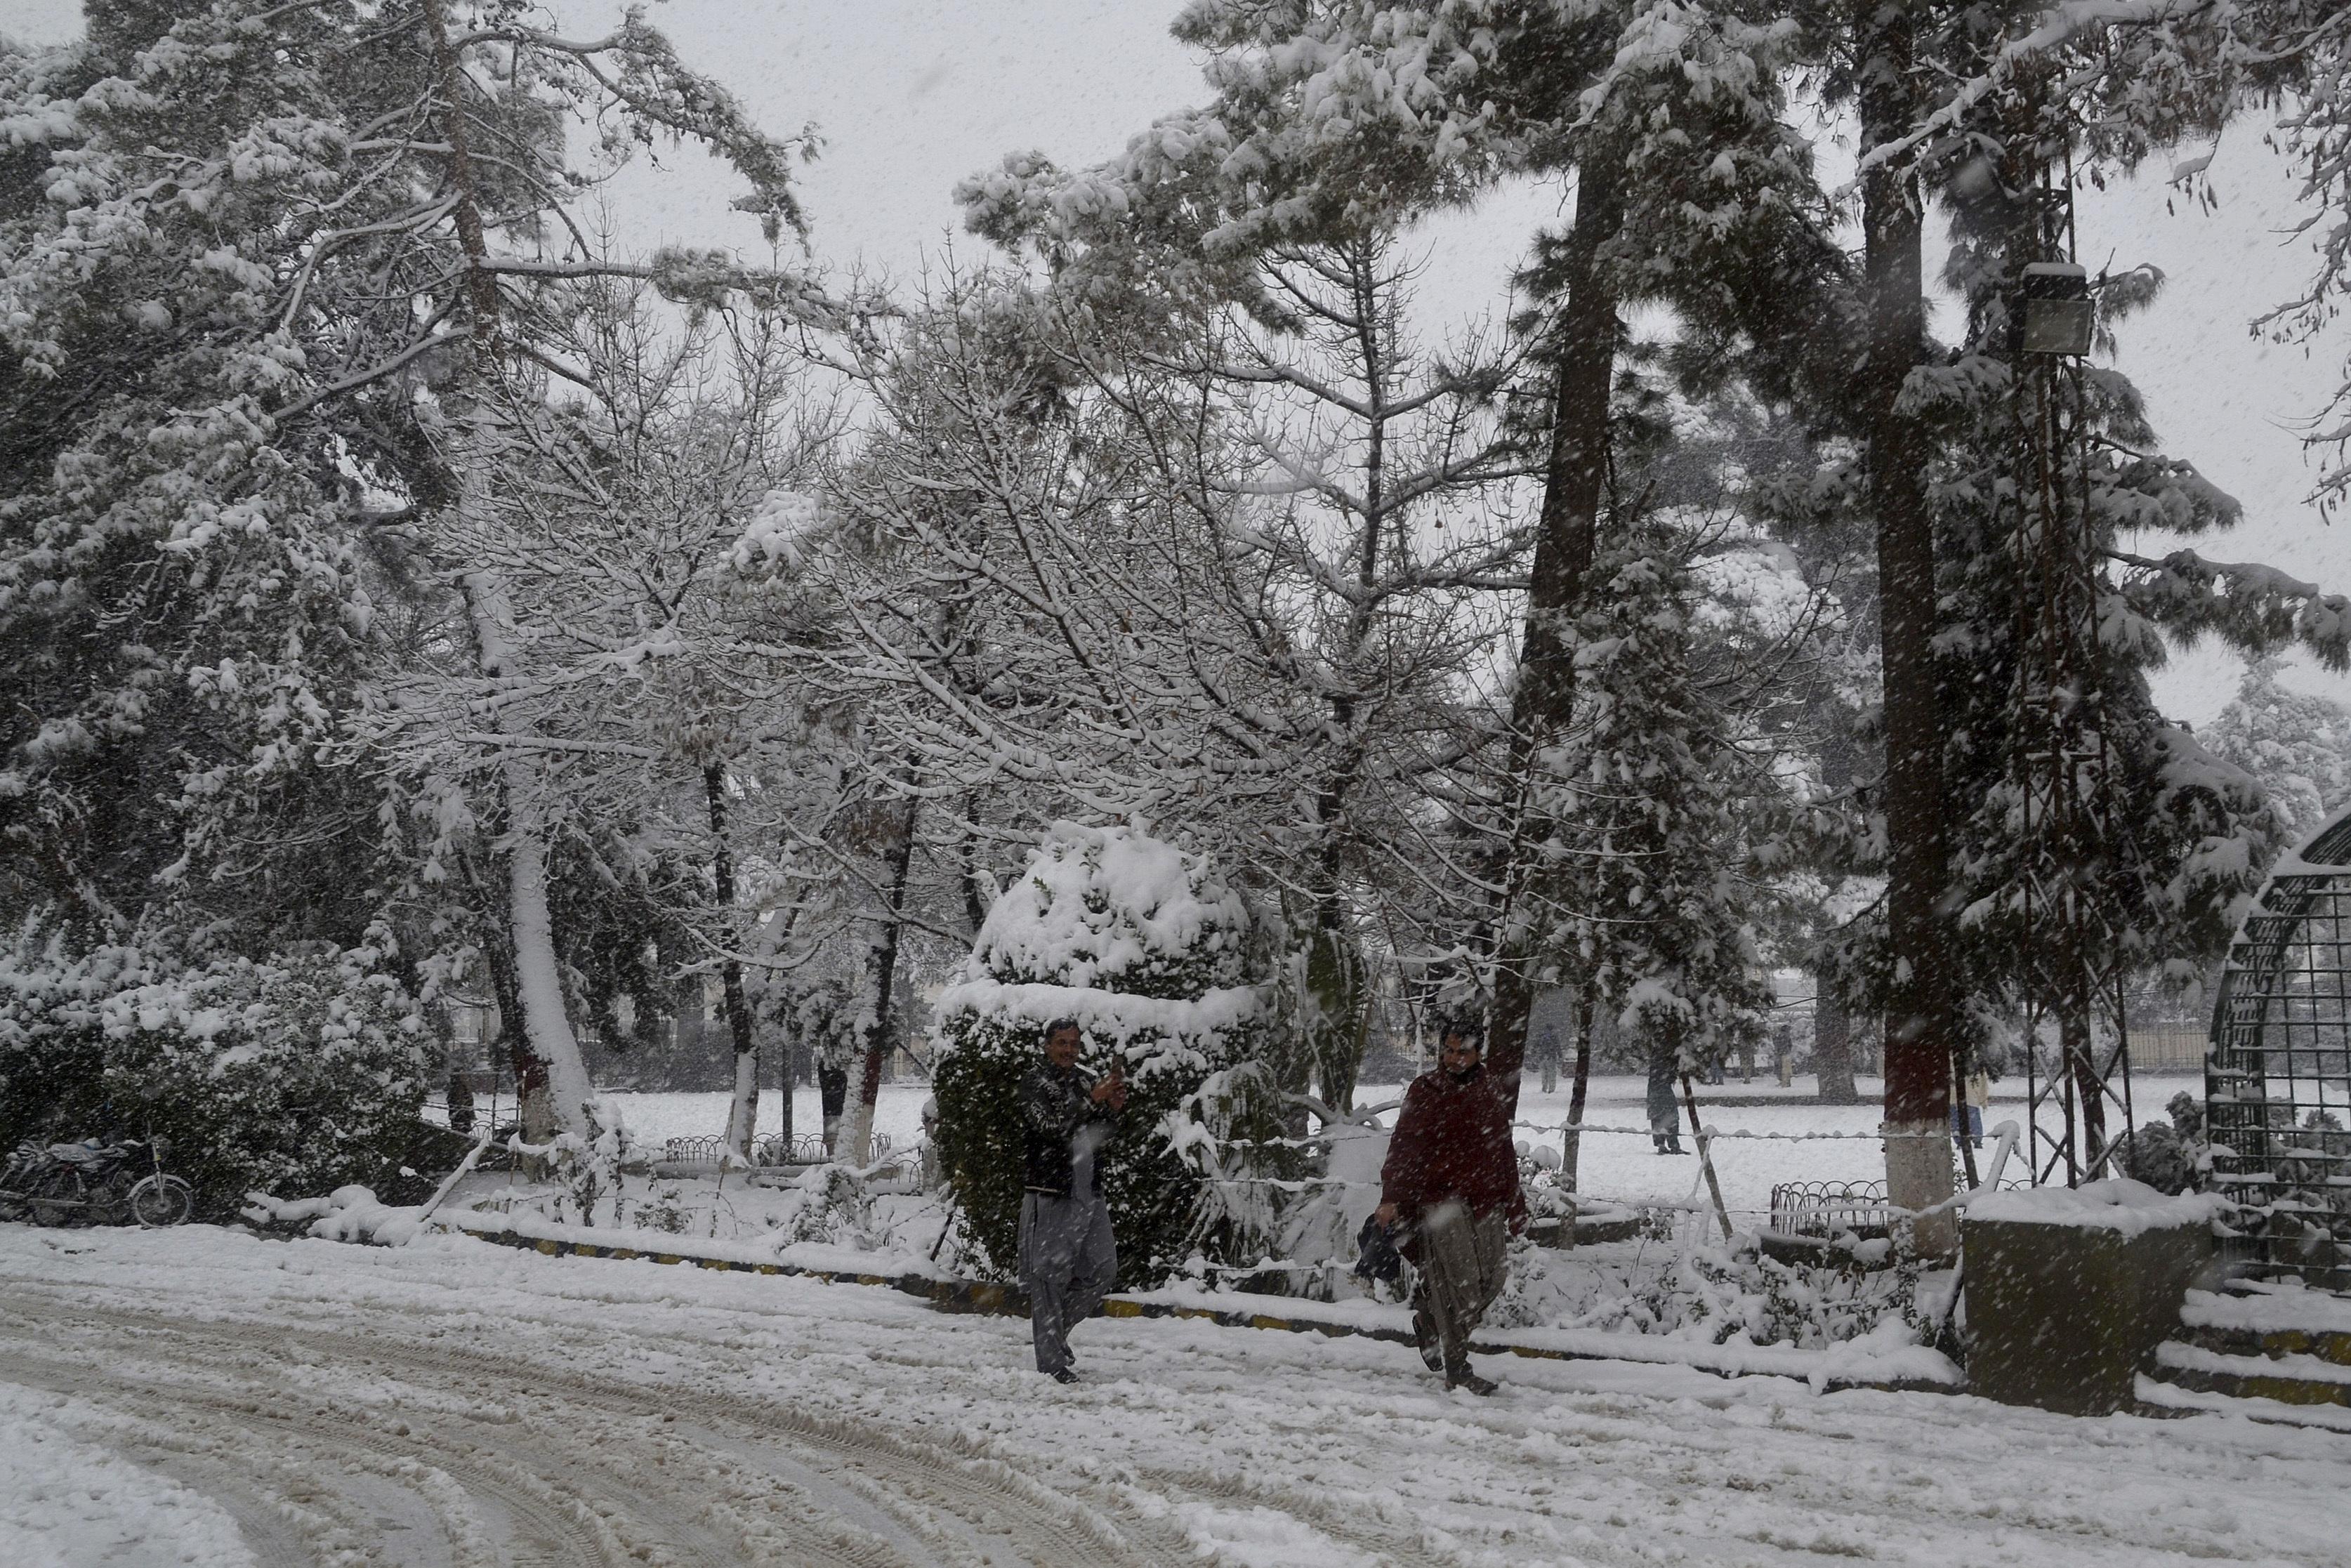 Severe weather in Afghanistan, Pakistan leaves 48 dead